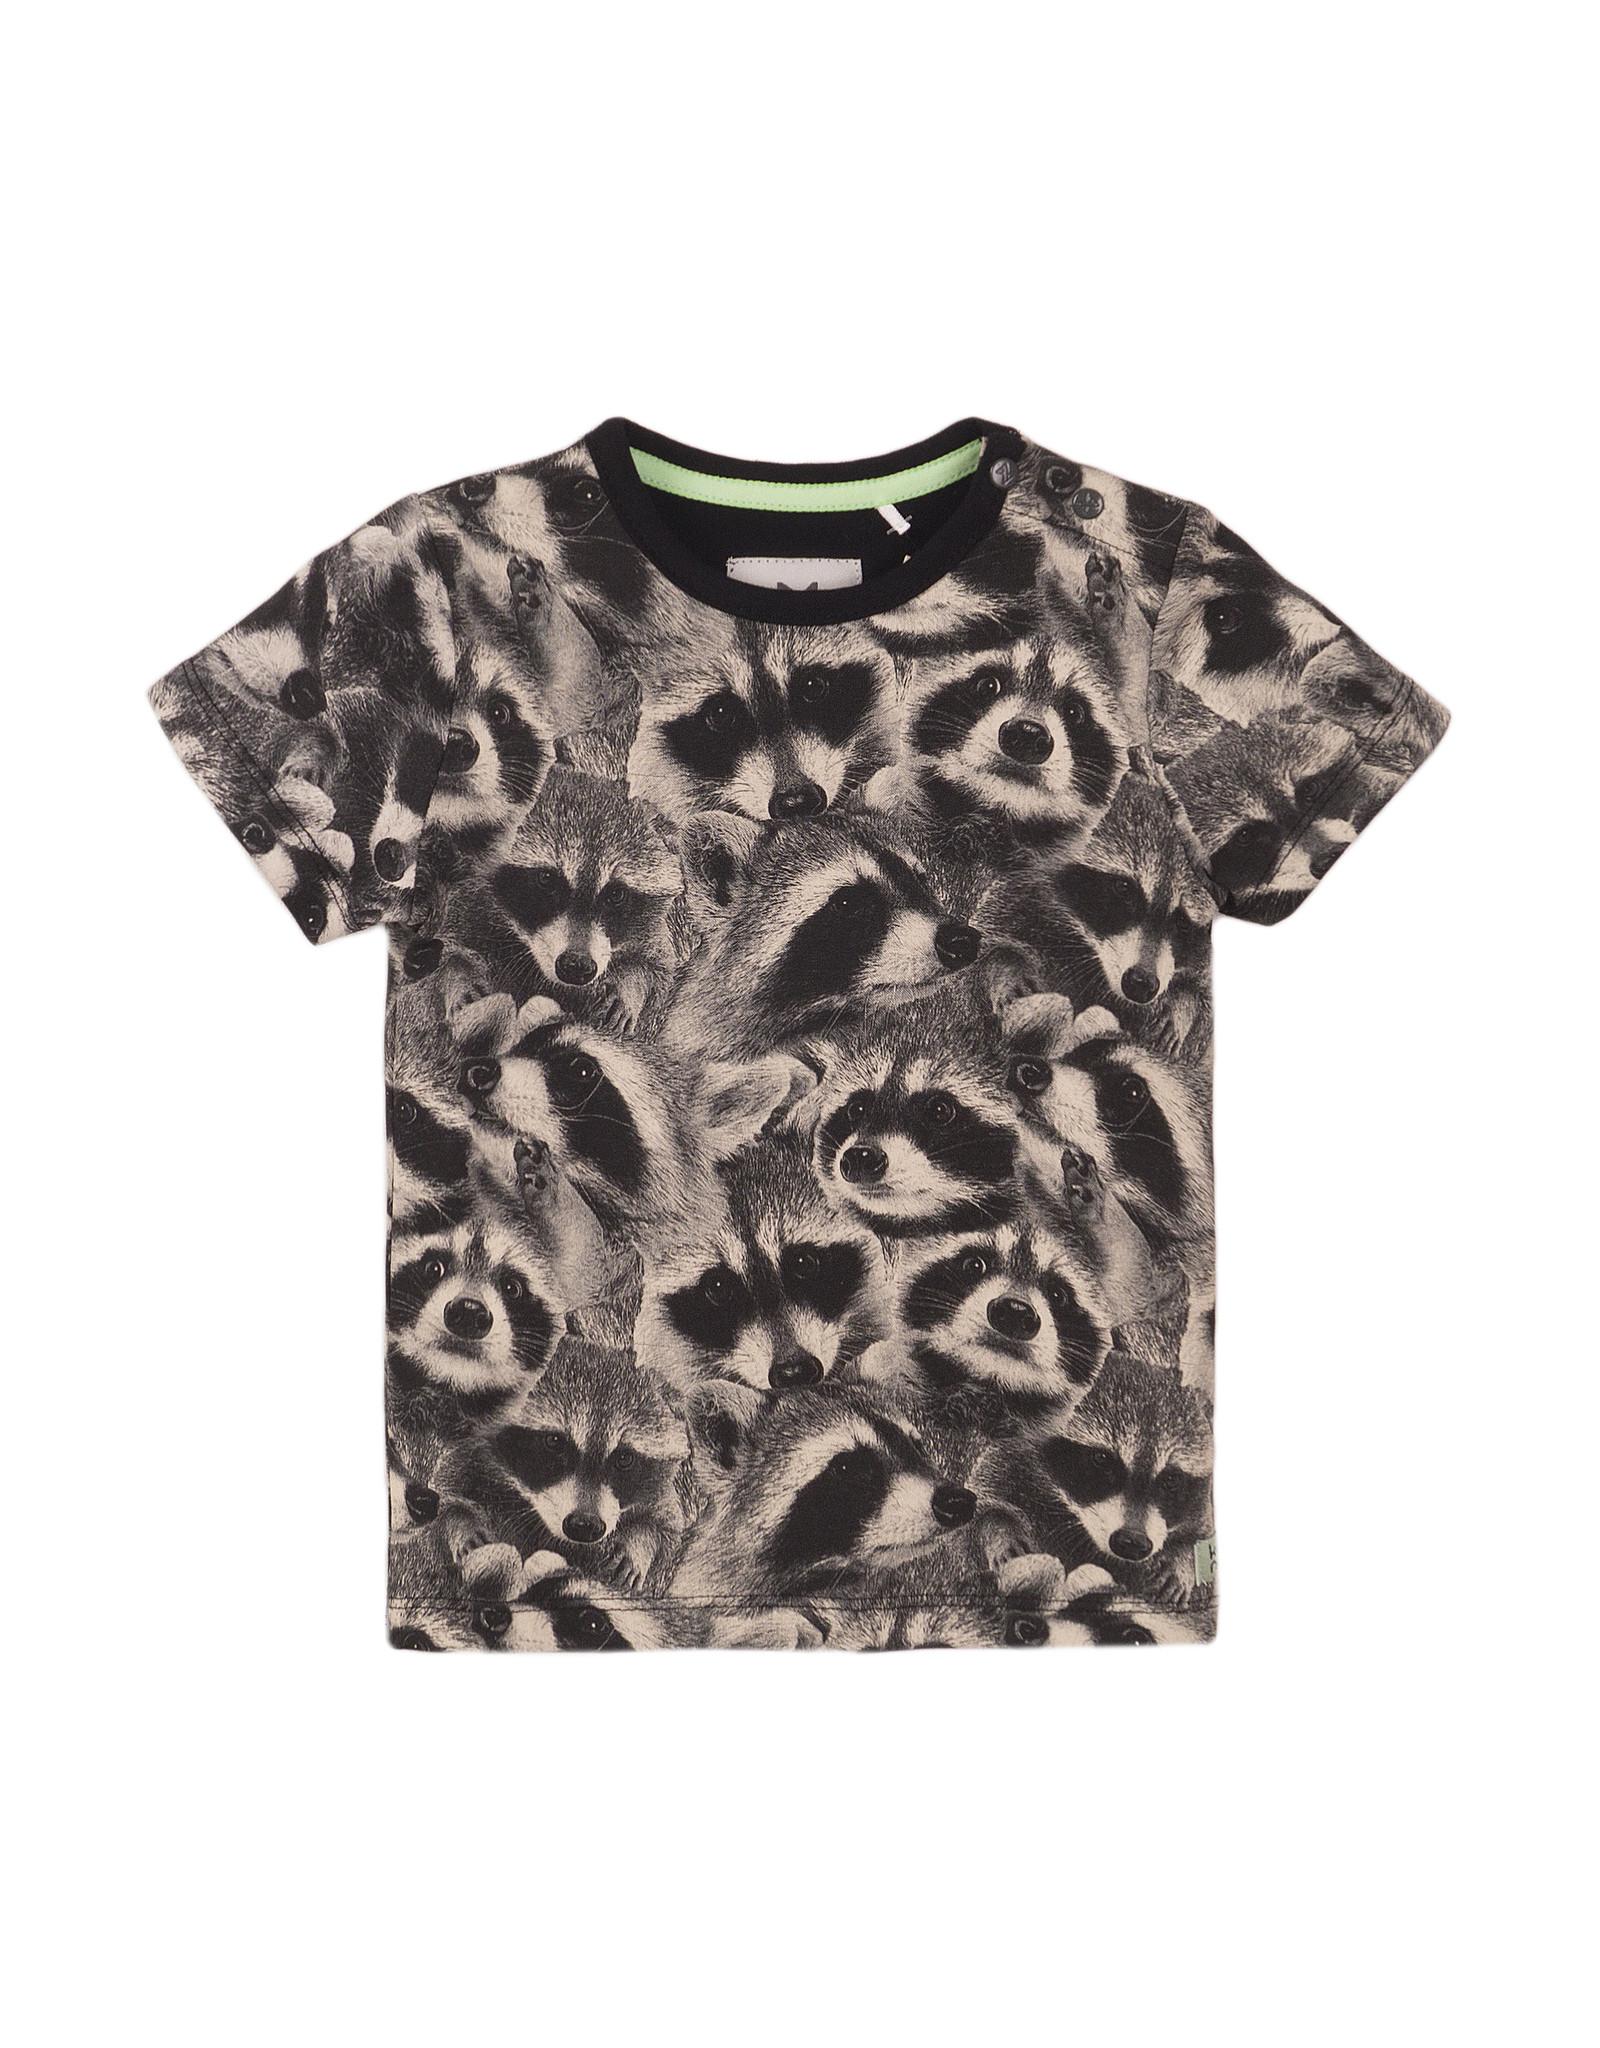 Koko Noko T-shirt shs, Dark grey, SS21